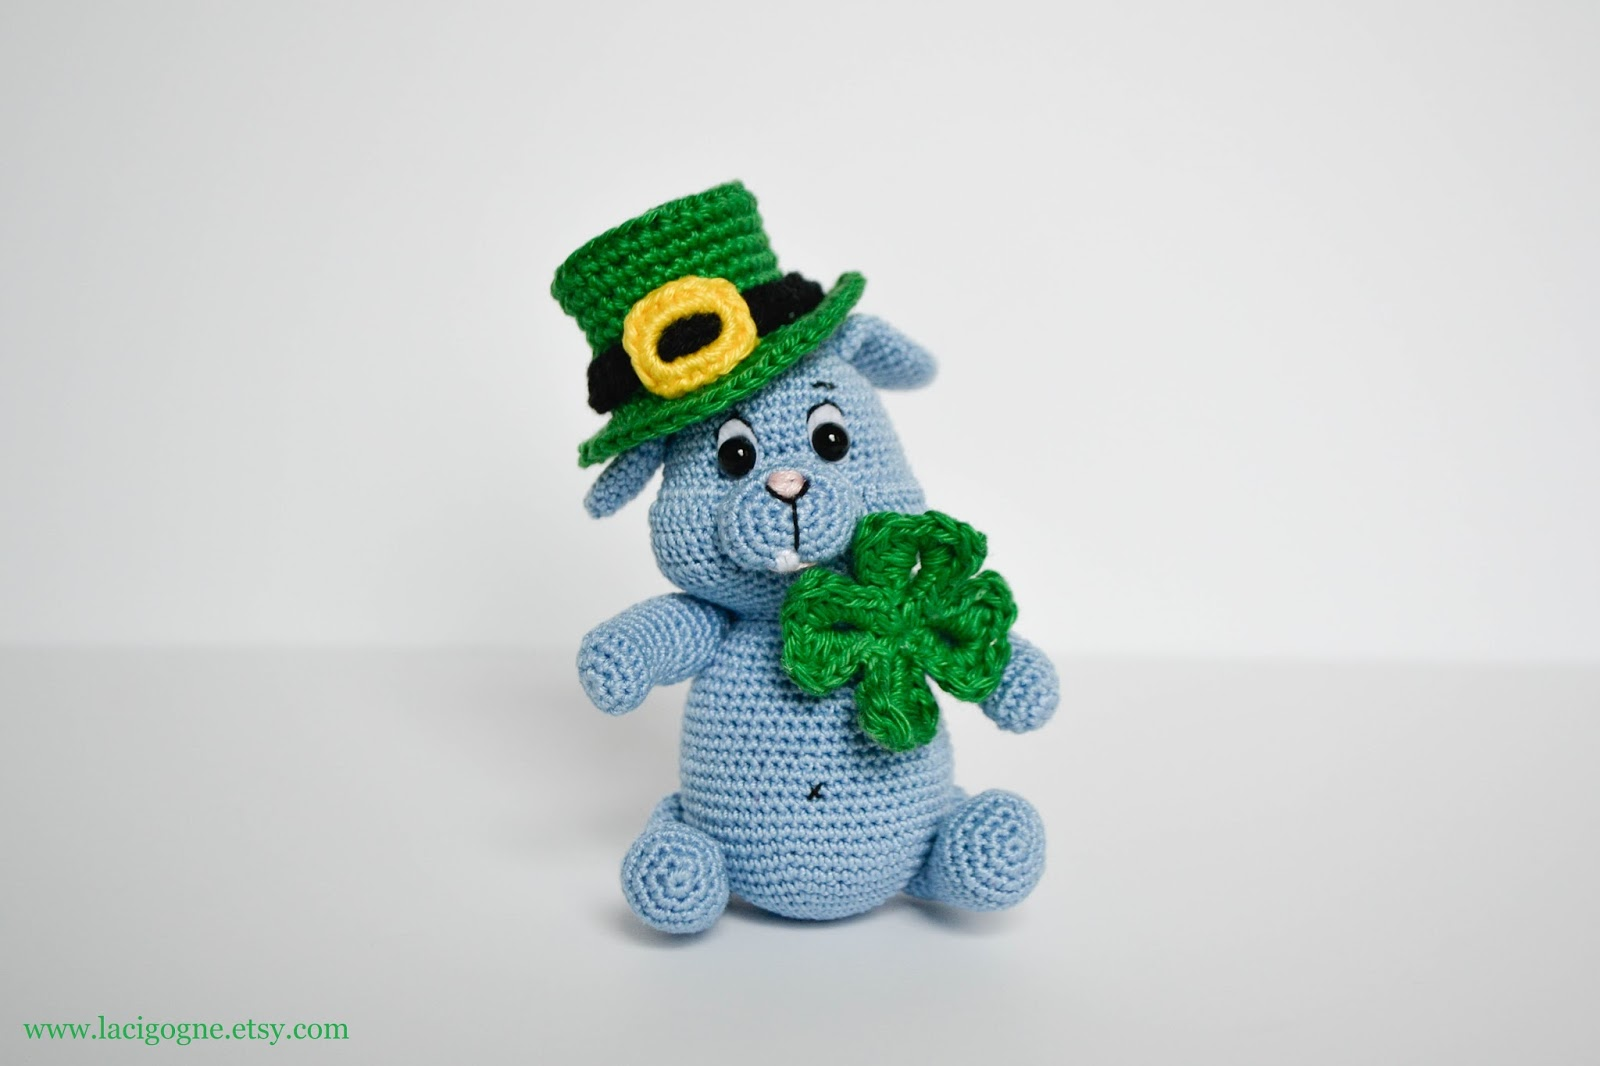 Free Amigurumi Leprechaun Pattern : La cigogne: st. patrick's day top hat free crochet pattern